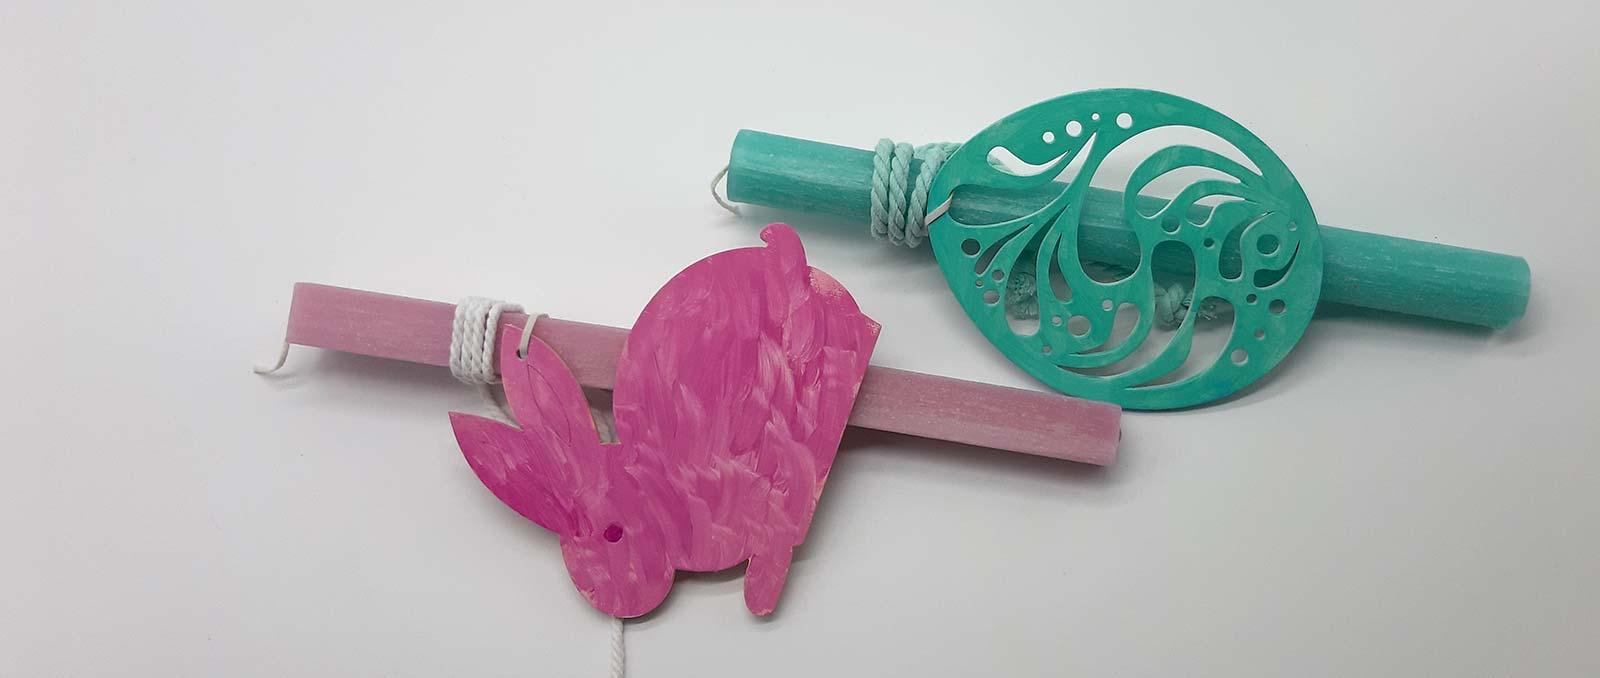 labades-pashalines-roz-tirkuaz